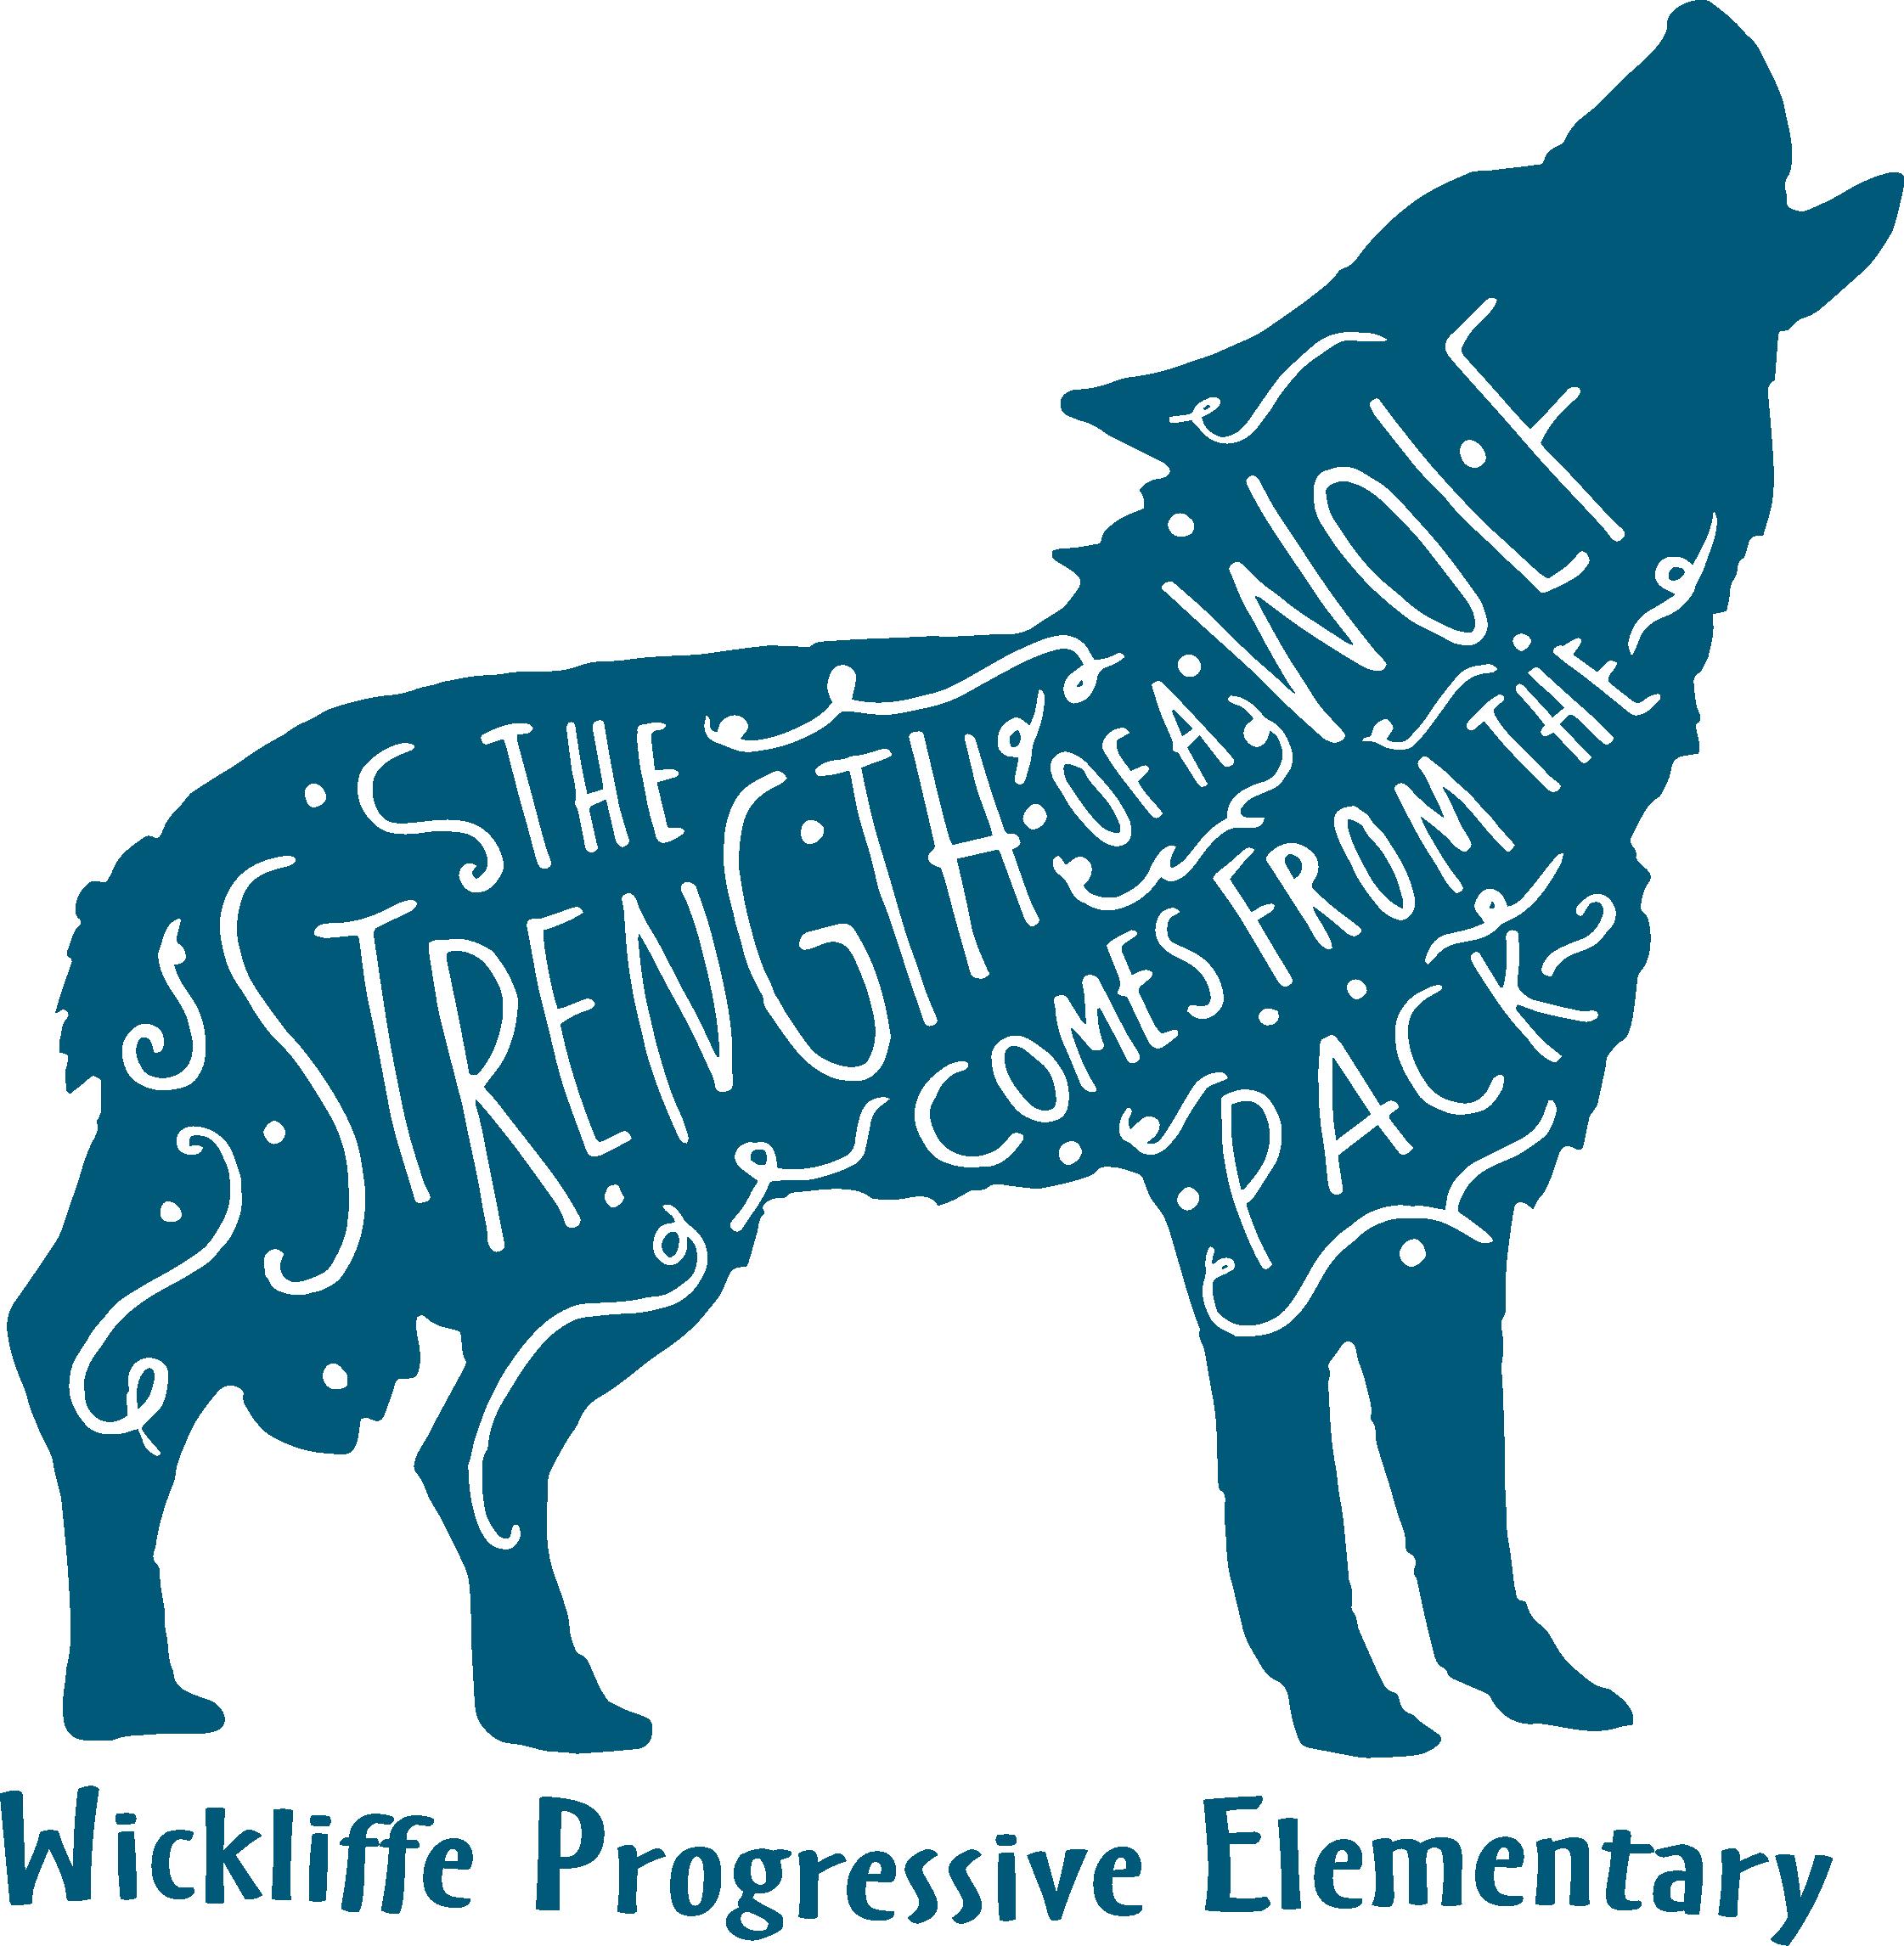 Wickliffe Progressive Elementary wolf logo